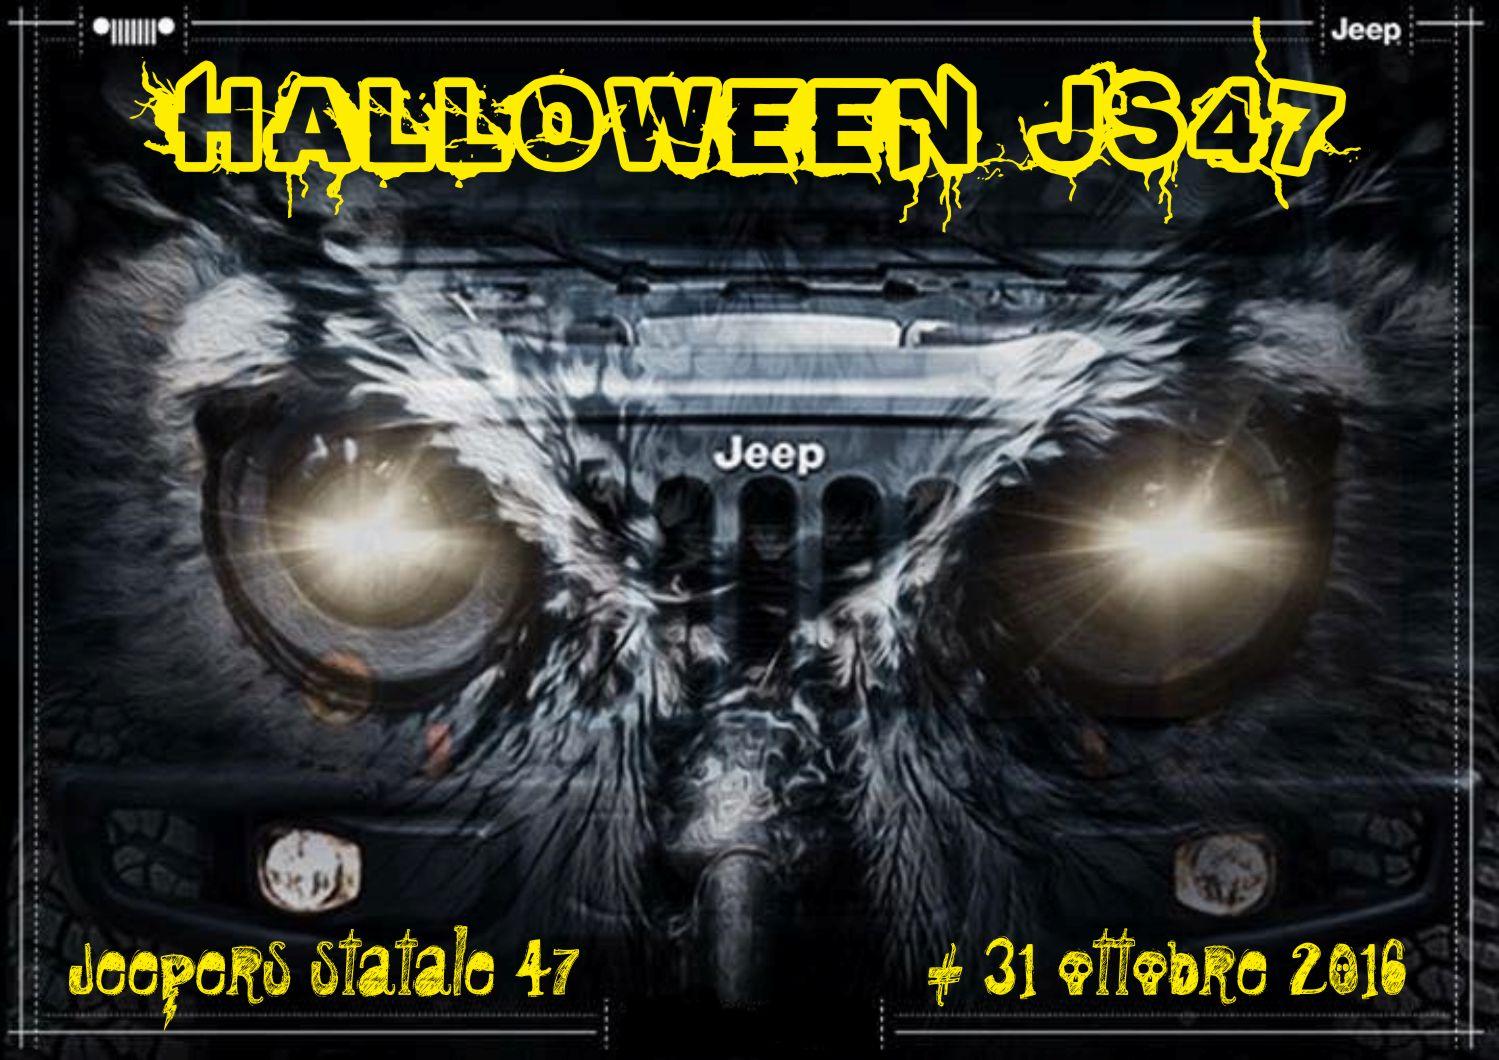 halloweenJS47